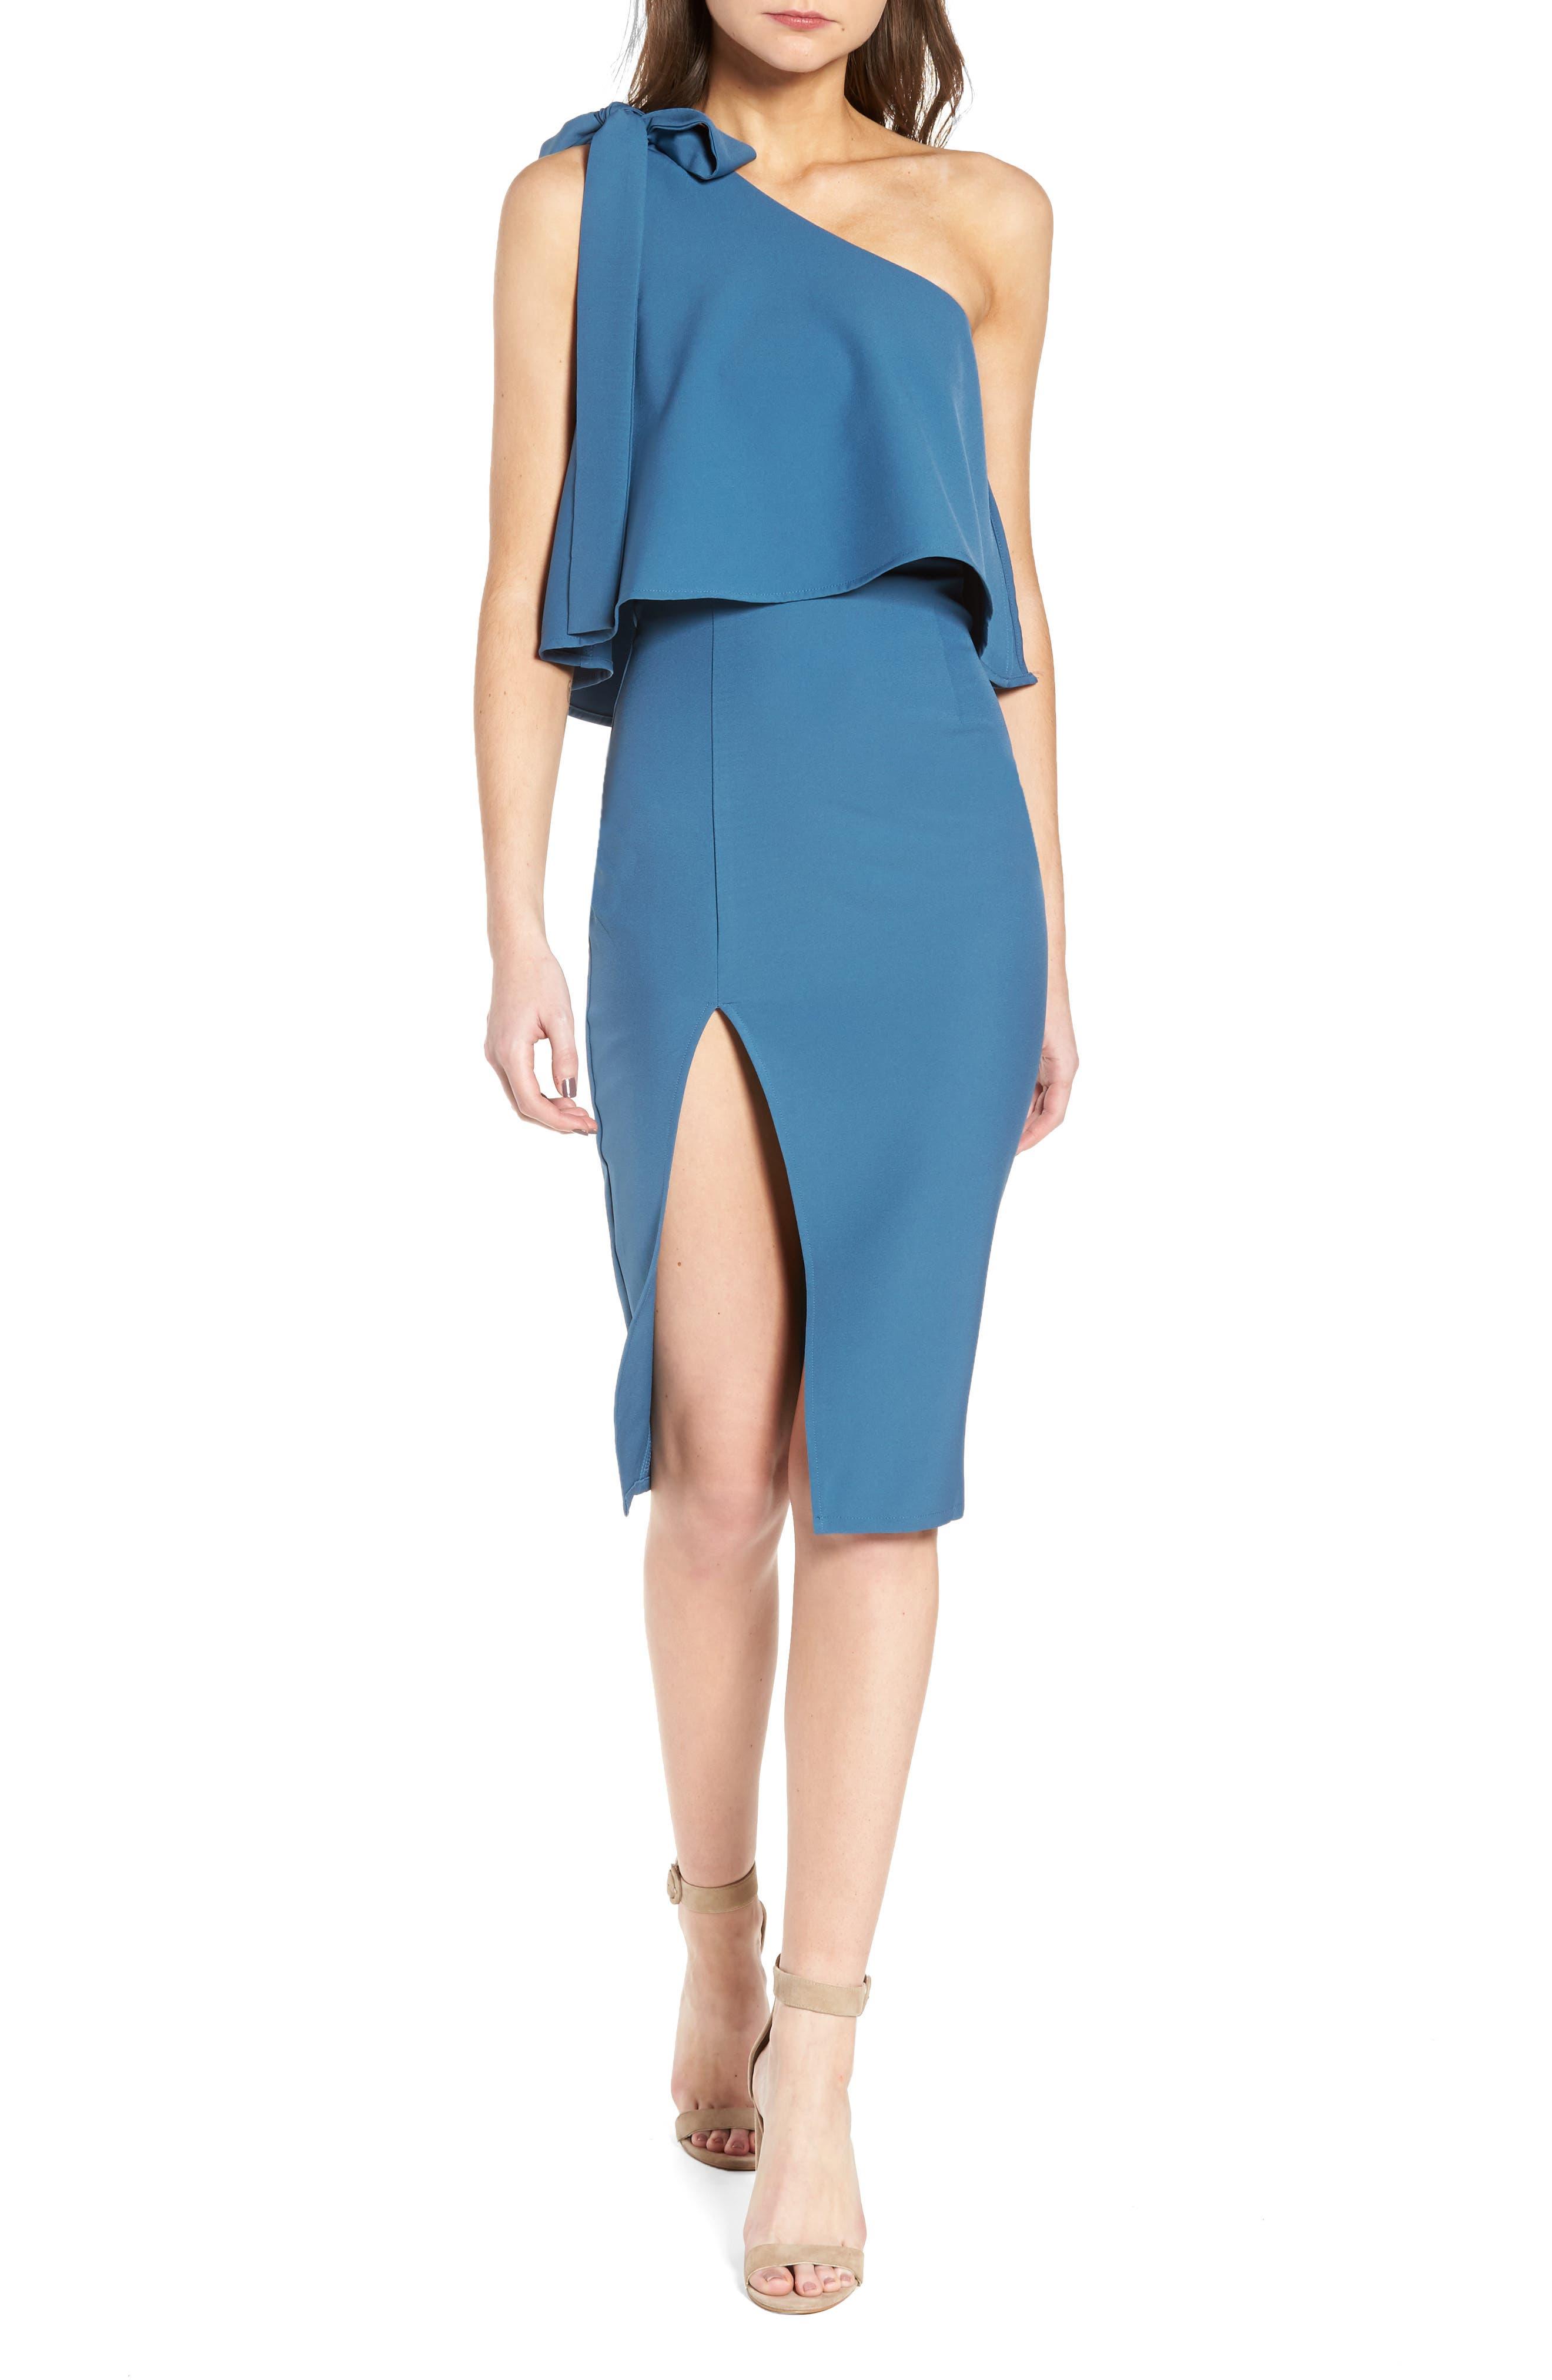 Missguided One-Shoulder Overlay Sheath Dress